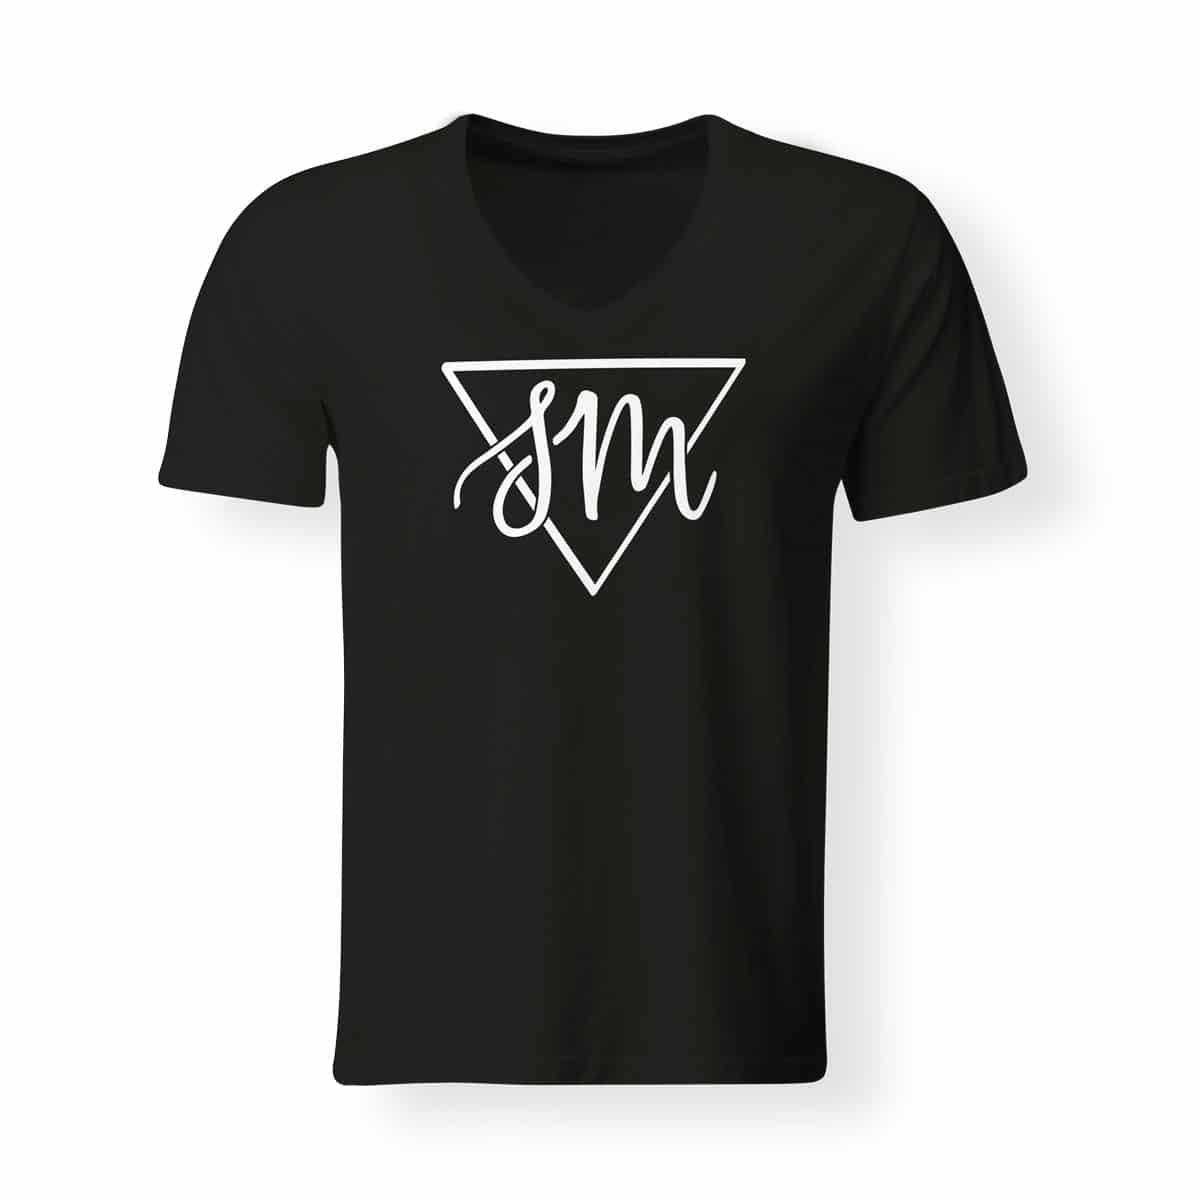 Sebastian von Mletzko T-Shirt Herren V Neck schwarz